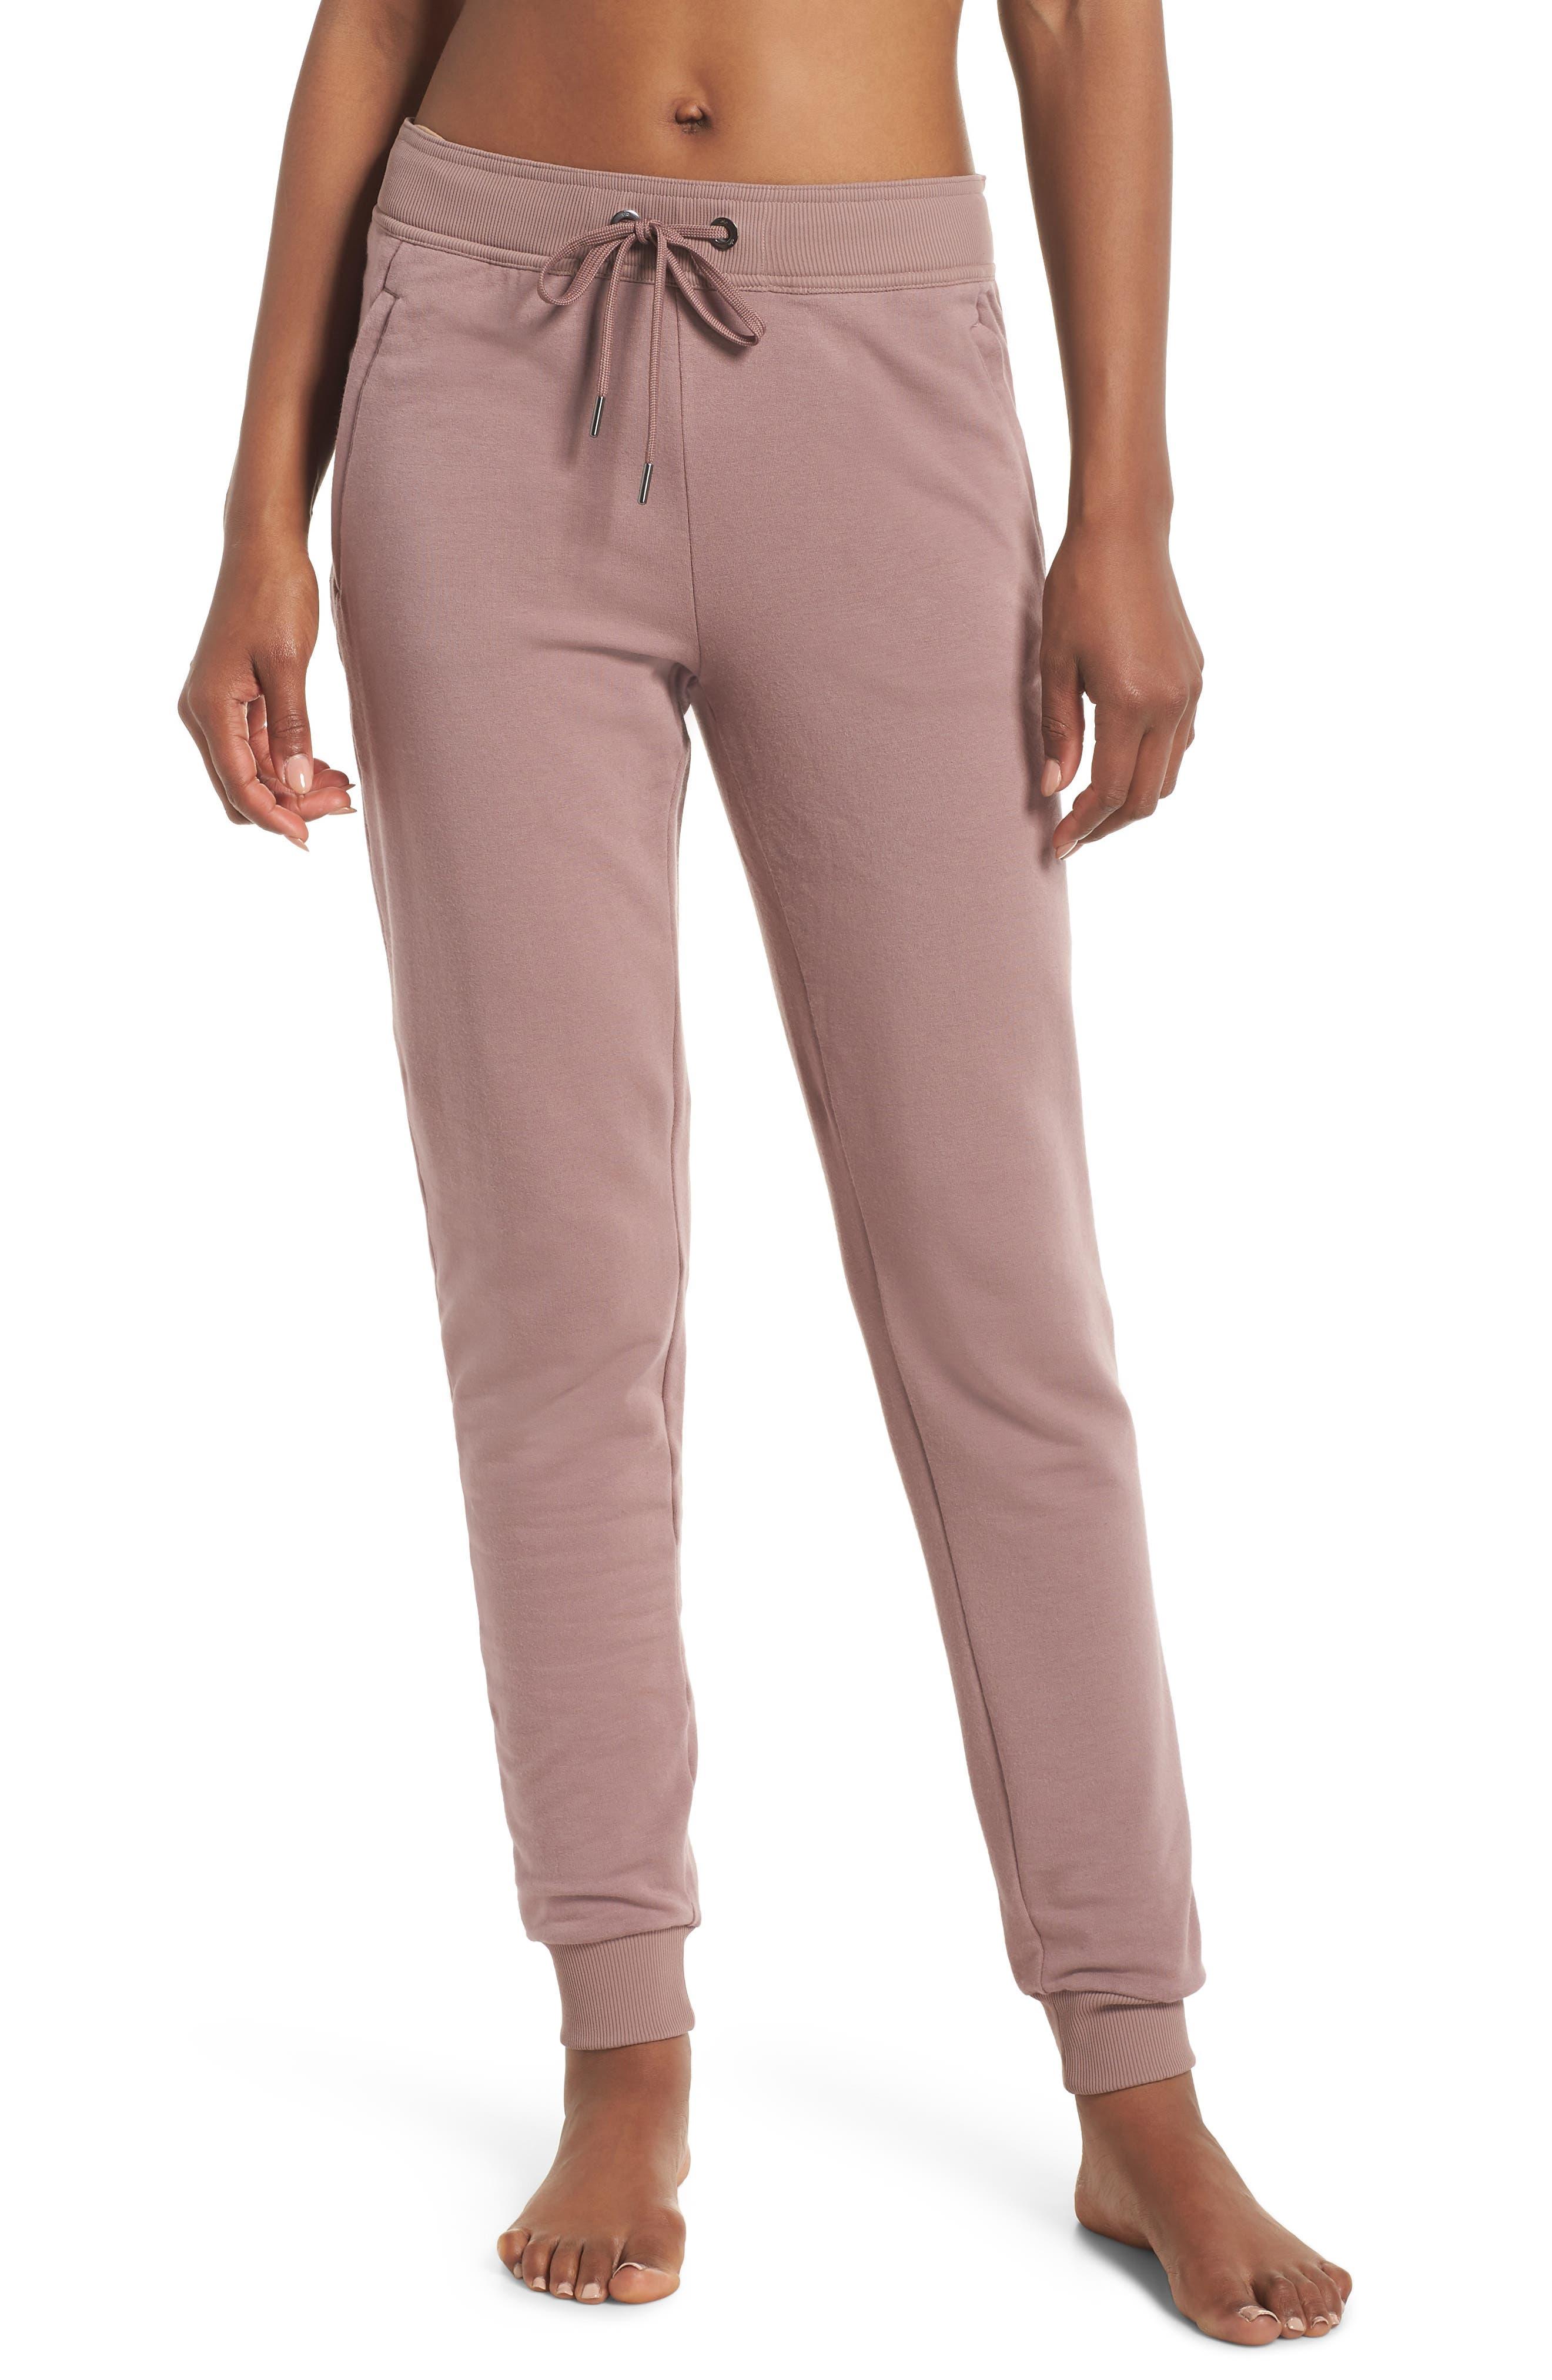 Journey Sweatpants,                         Main,                         color, Smokey Quartz